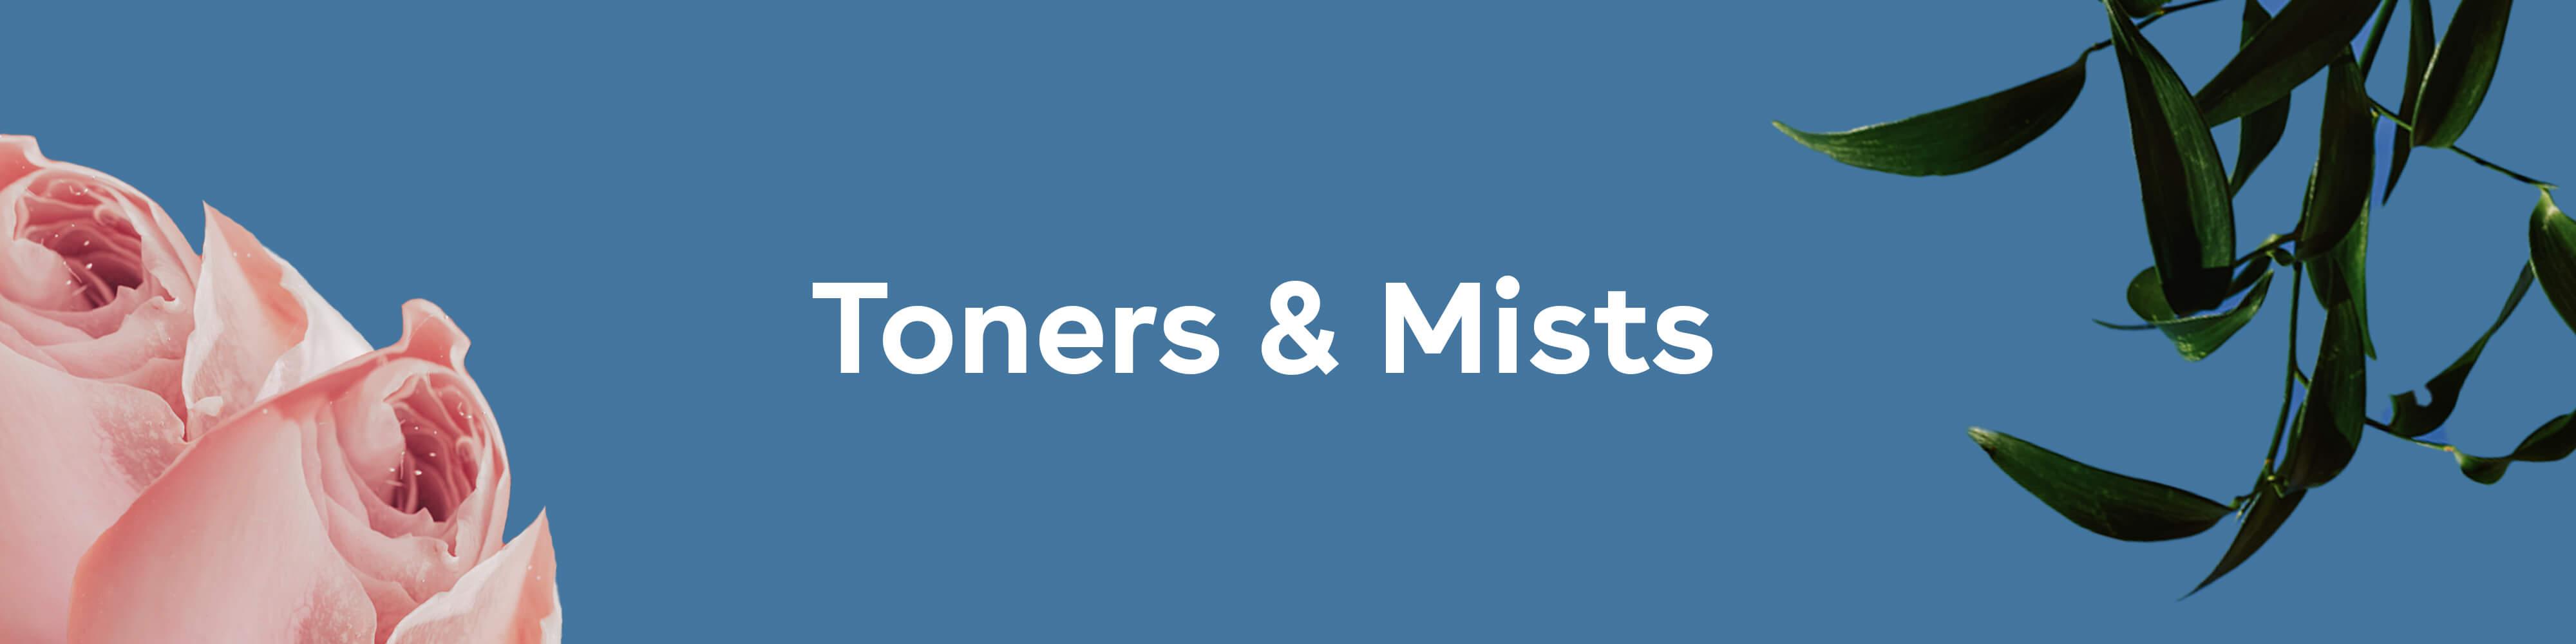 Nuria toners and mists